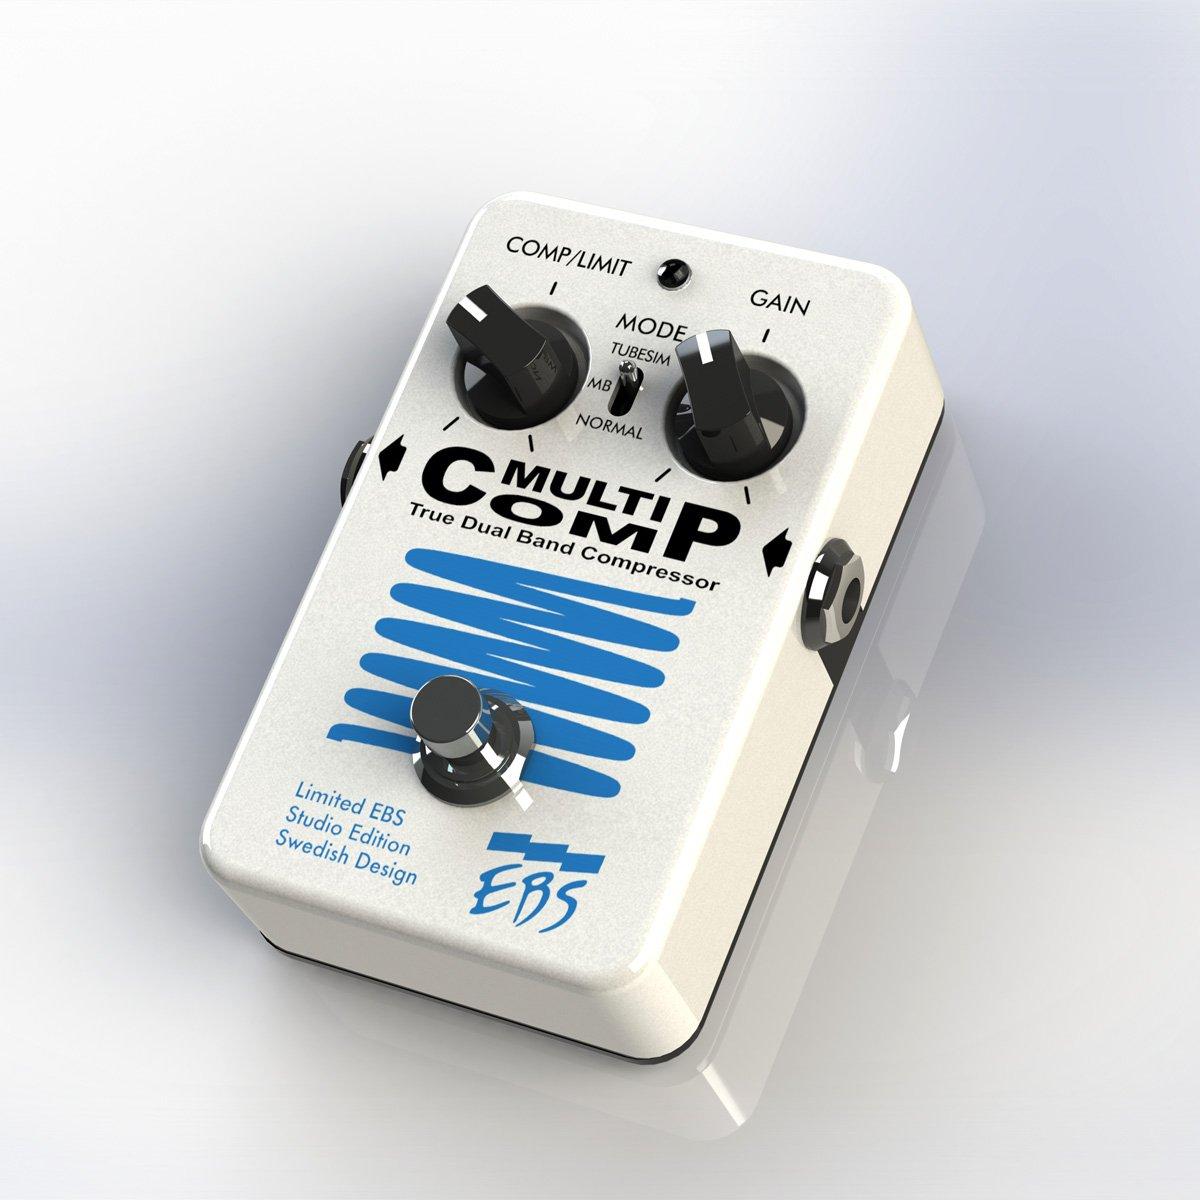 EBS/MultiComp Studio Edition Limited Pearl White Edition コンプレッサー B07DVYXH4D